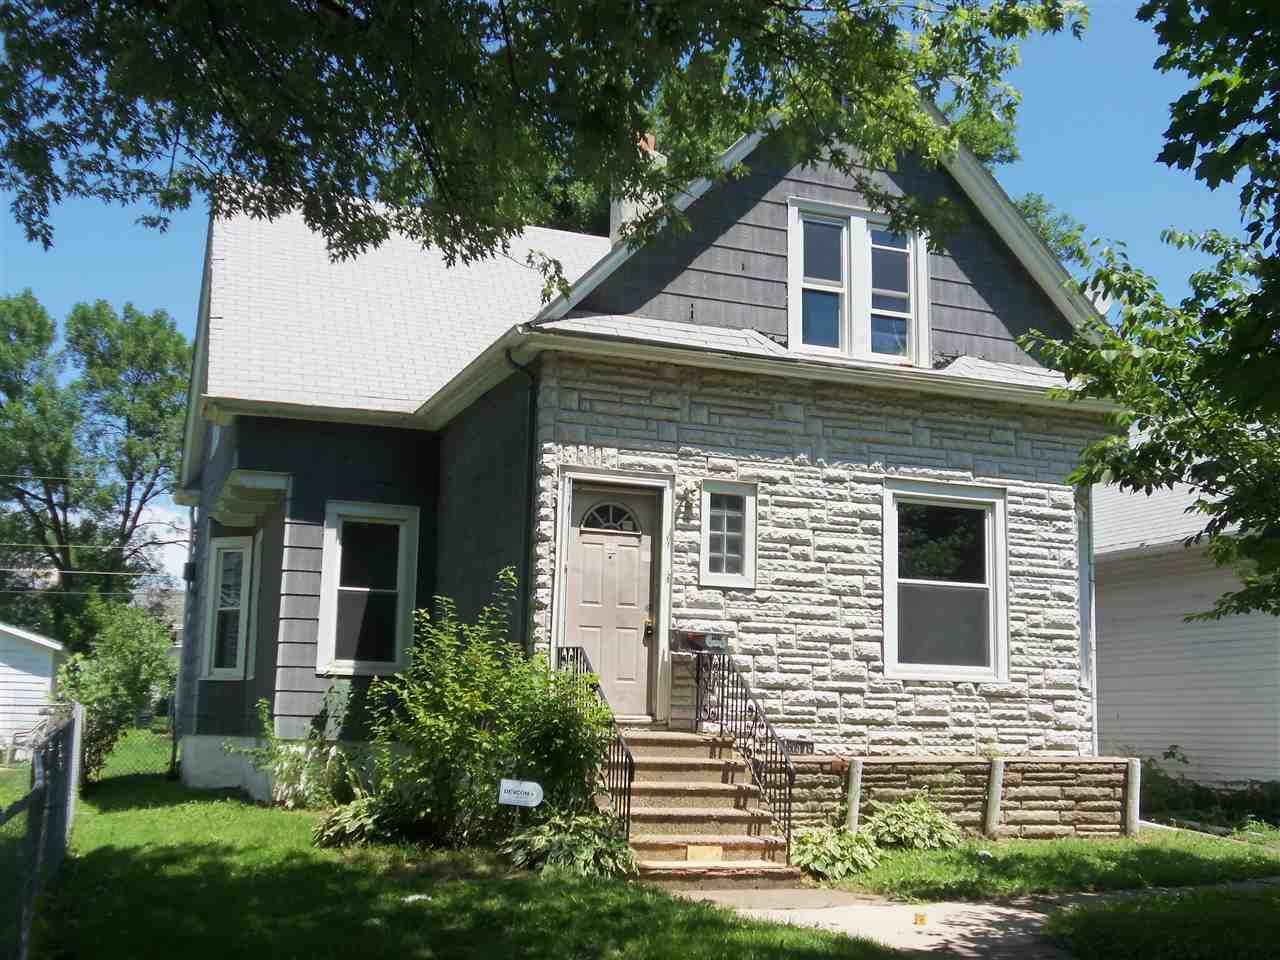 Real Estate for Sale, ListingId: 34176743, Davenport,IA52803